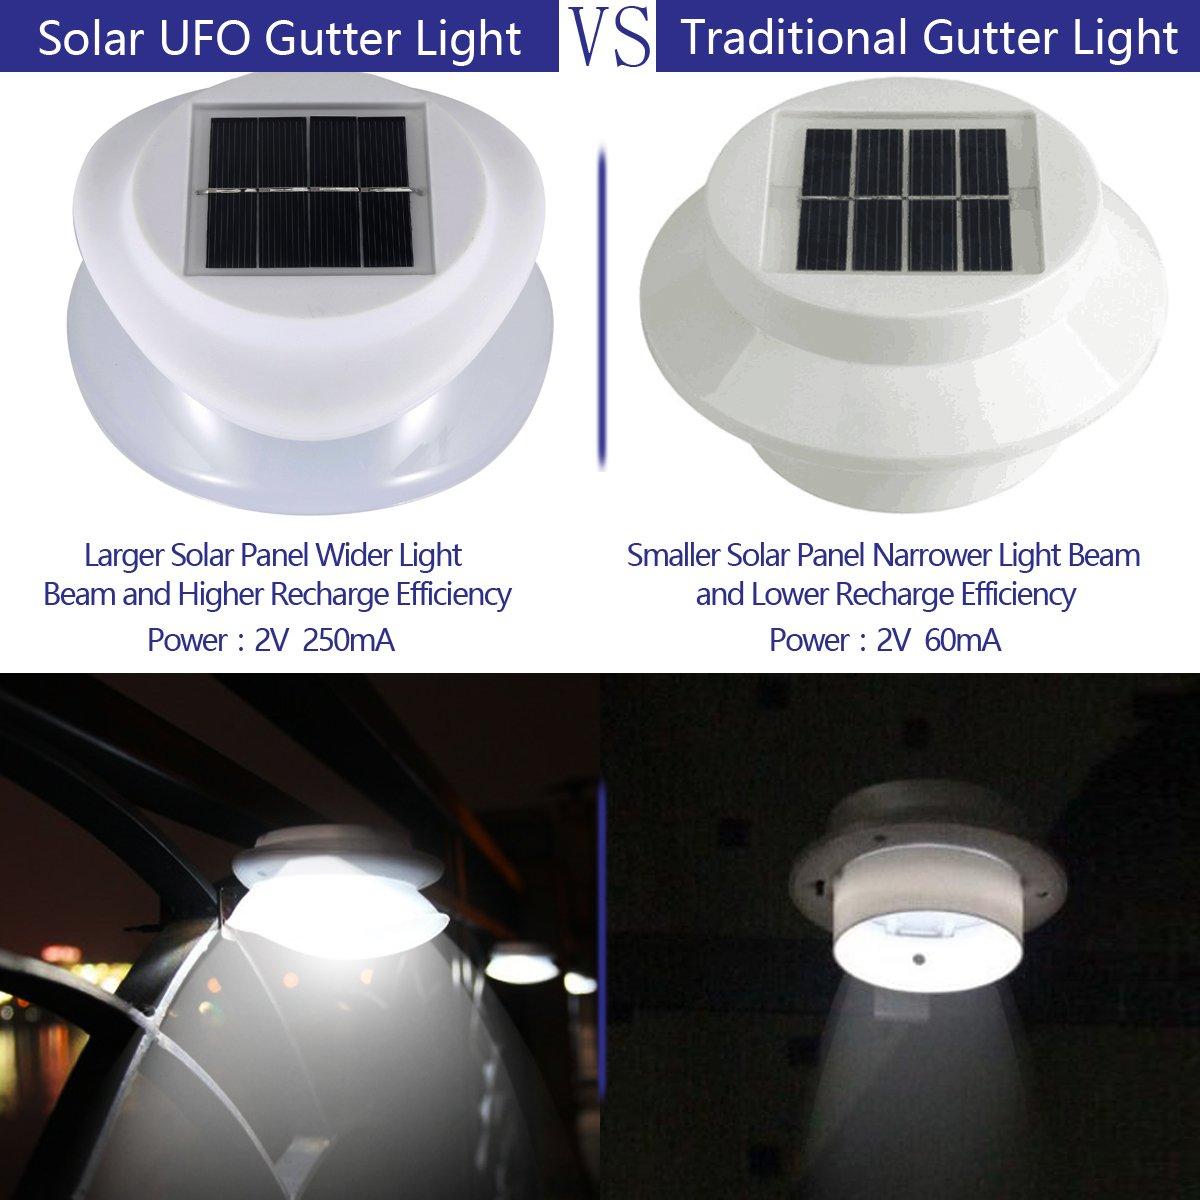 MOLEBIT Solar Gutter Lights Super Bright 9 LED Waterproof Wireless Security Lights Fence Light for Outdoor Garden Wall Yard Deck White 1 Pack